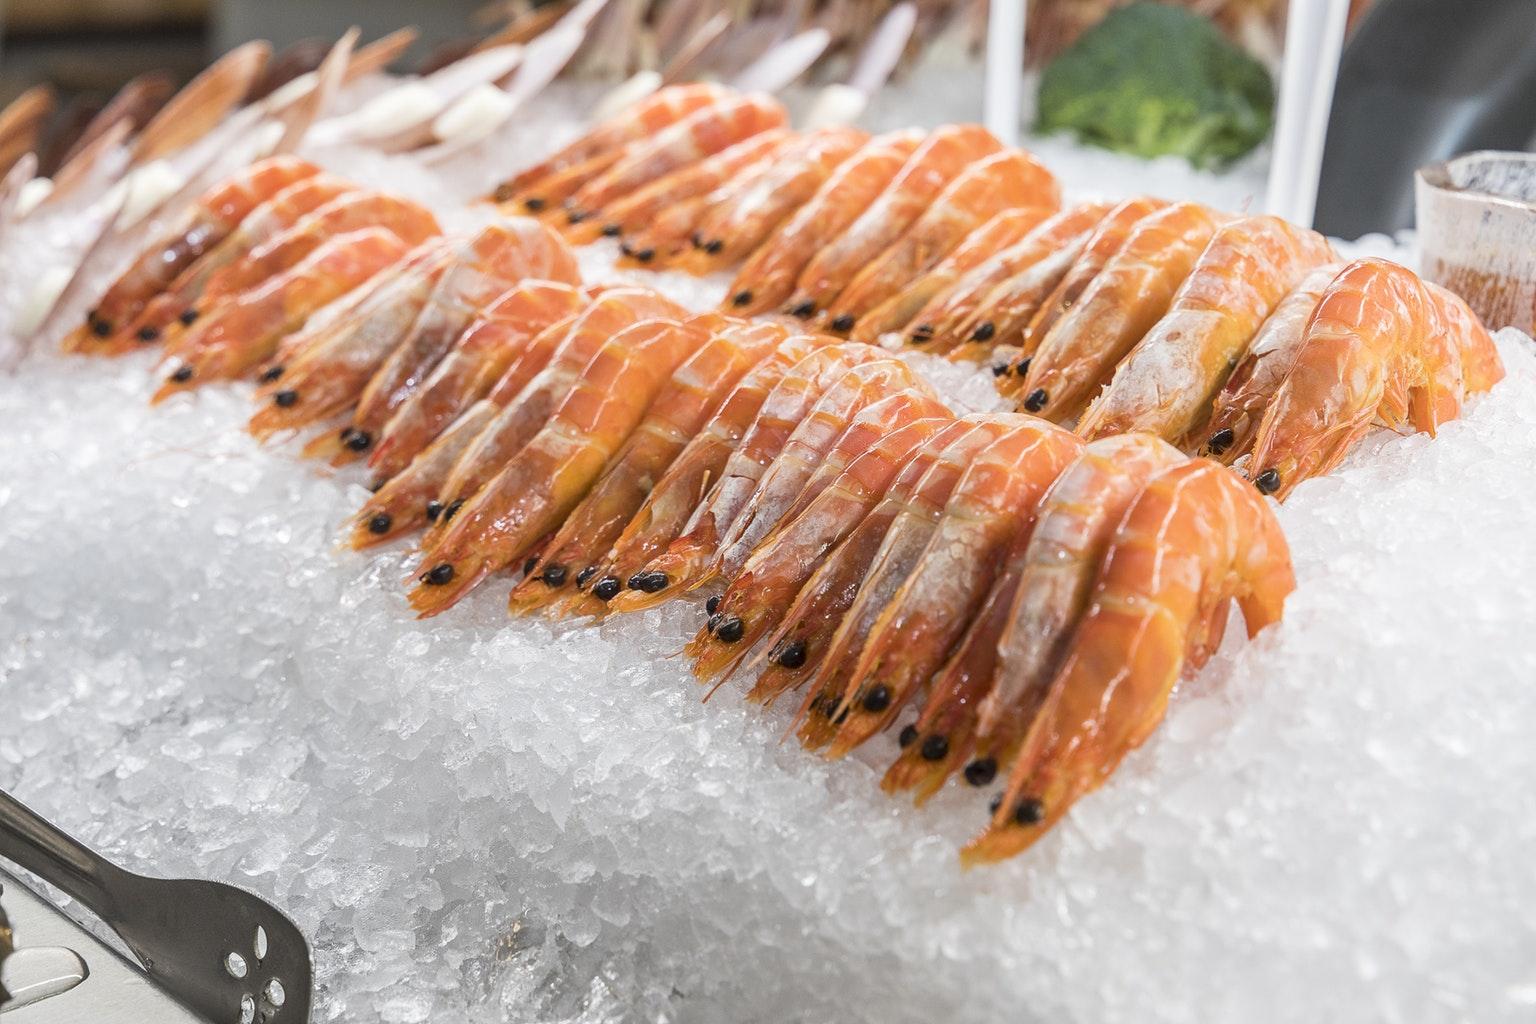 Prawns on ice - seafood buffet